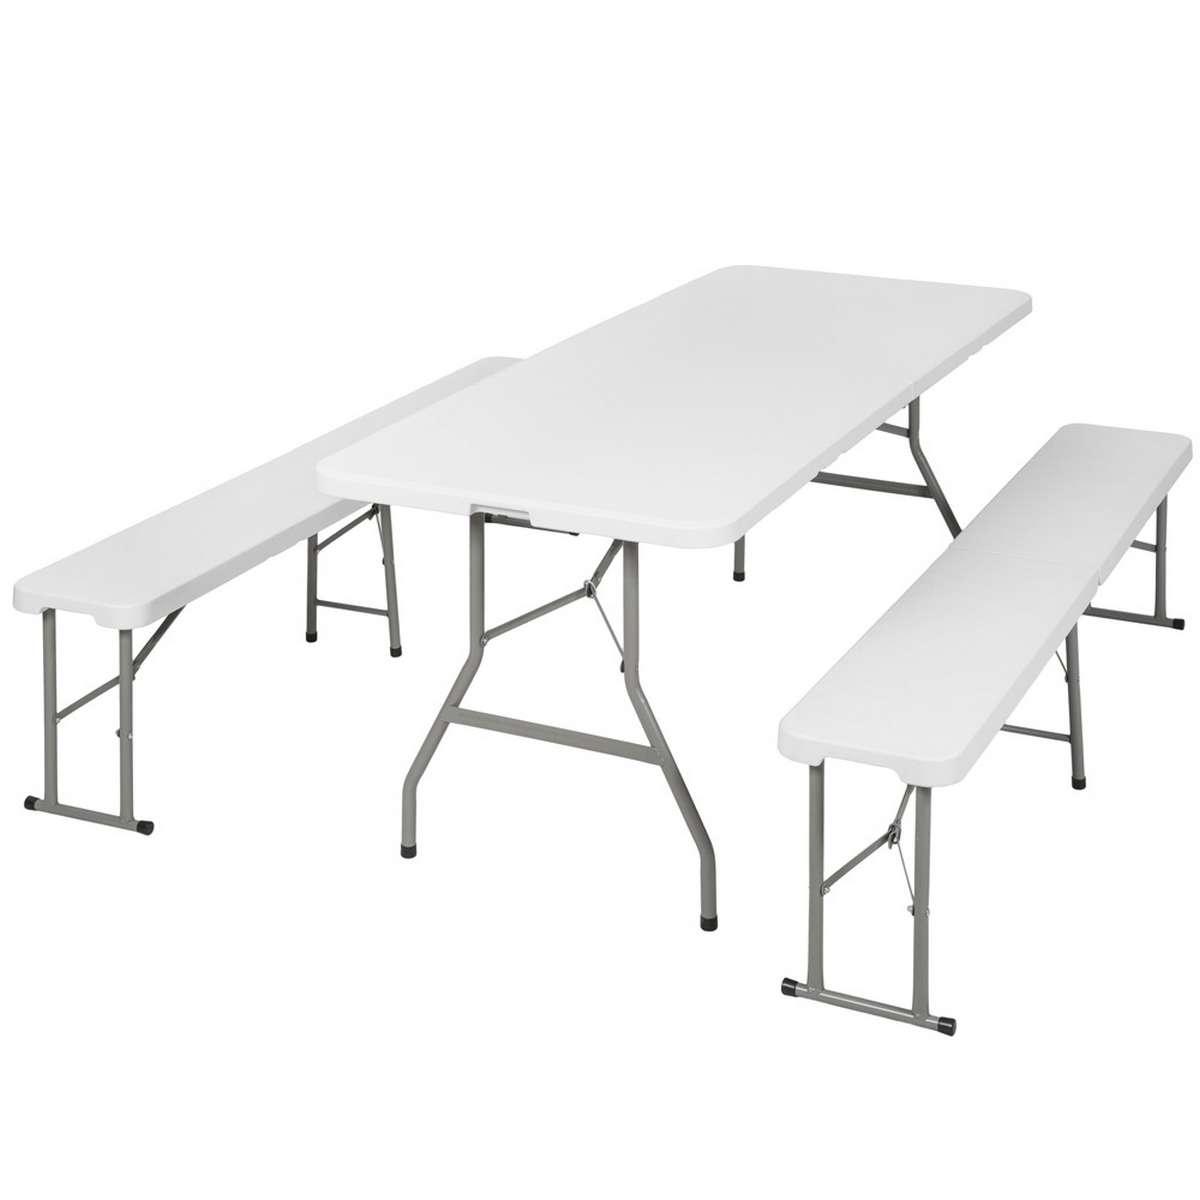 Table Bancs Camping Pliable Ensemble Table Buffet Banc Pliant Jardin